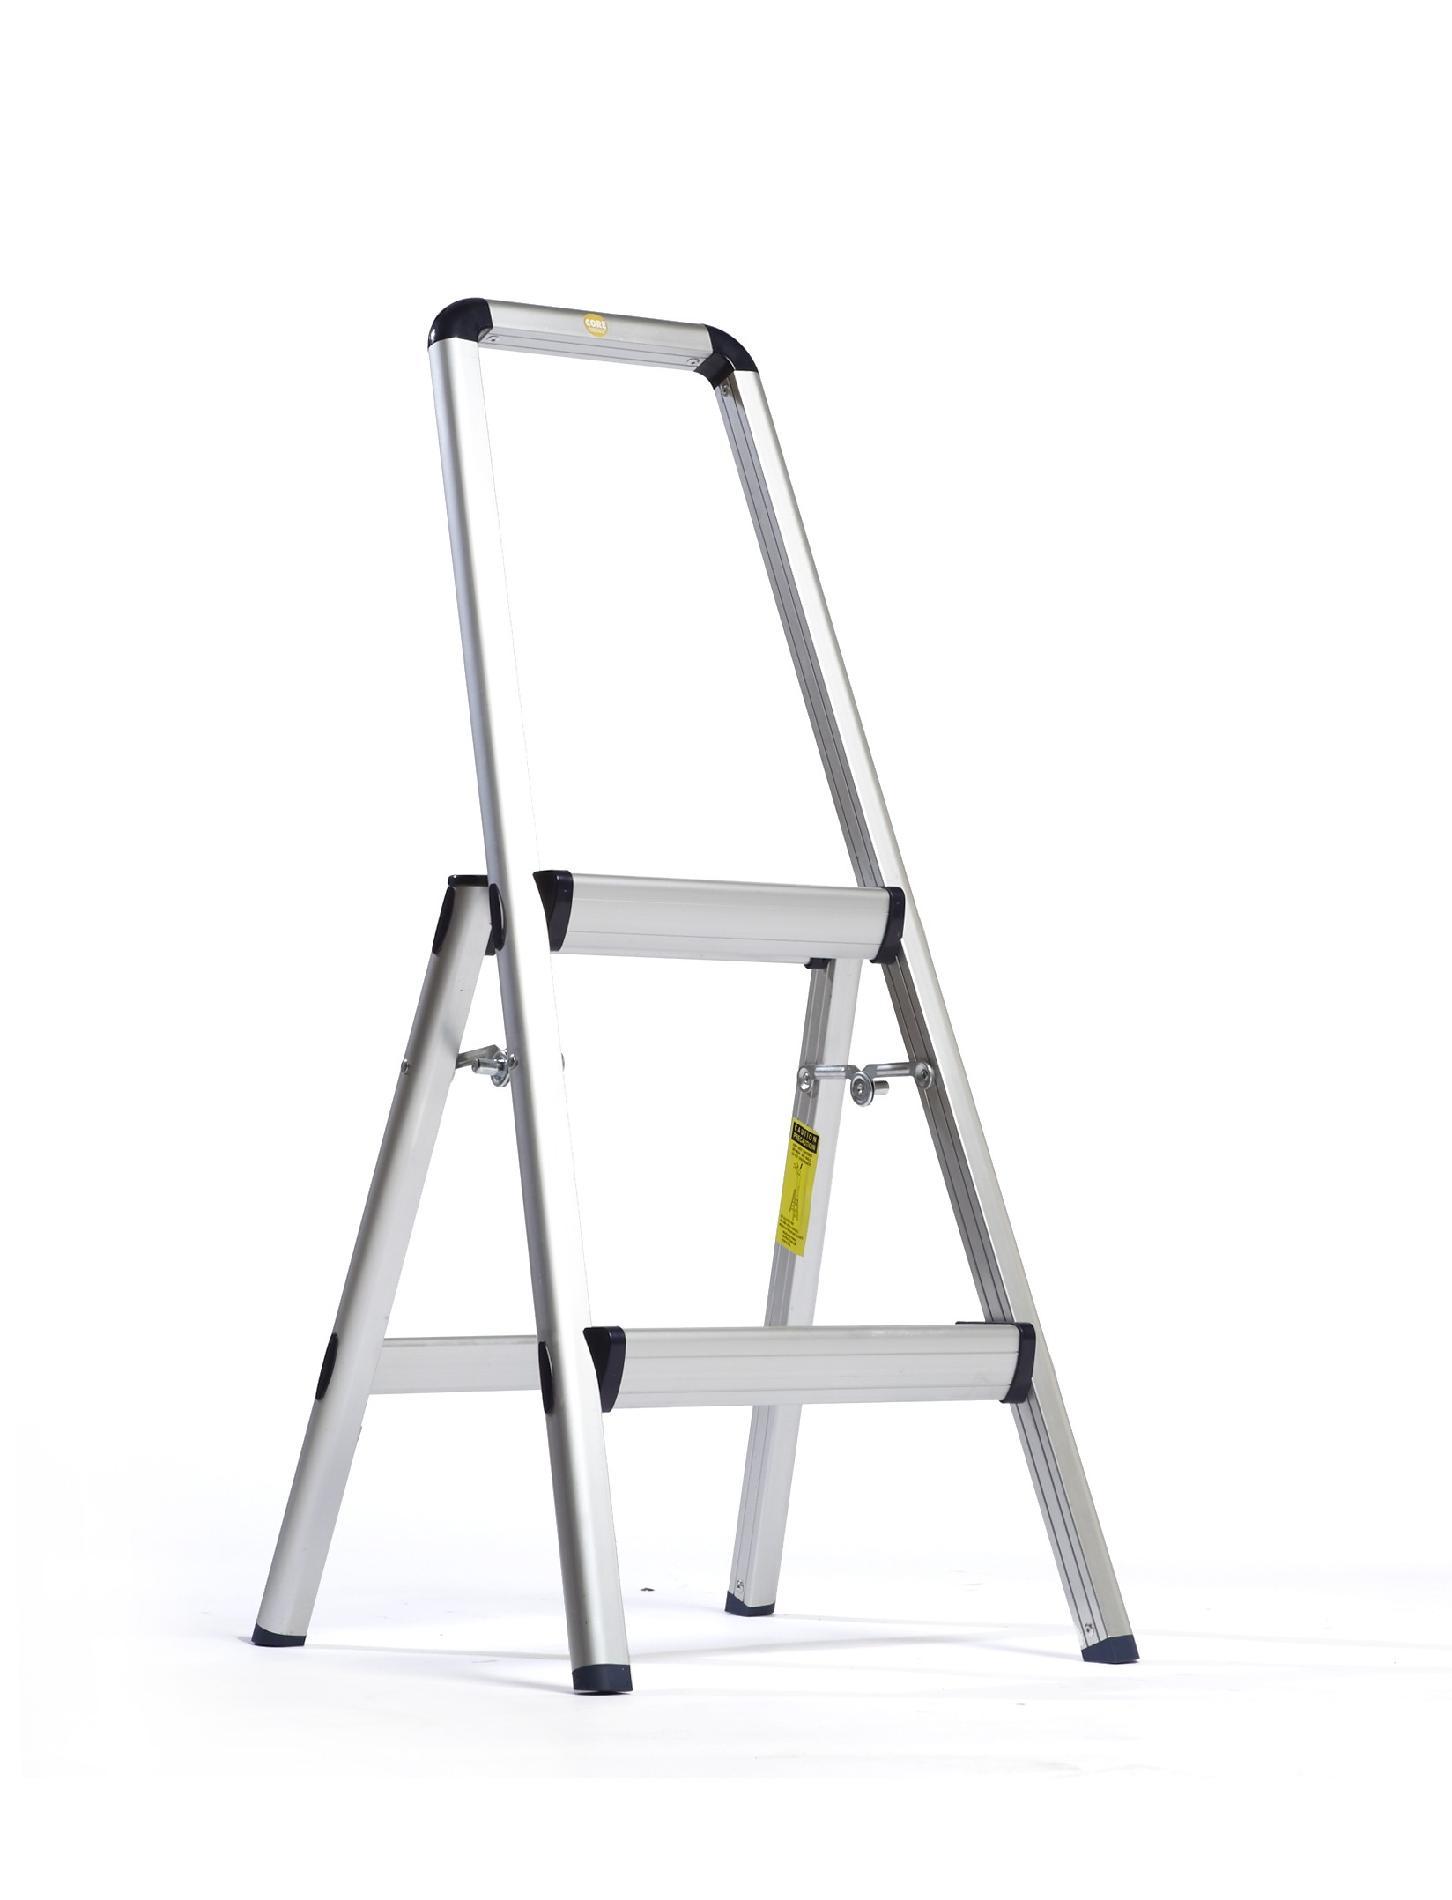 Xtend & Climb Lightweight Aluminum 2 Step Stool with Hand Rail